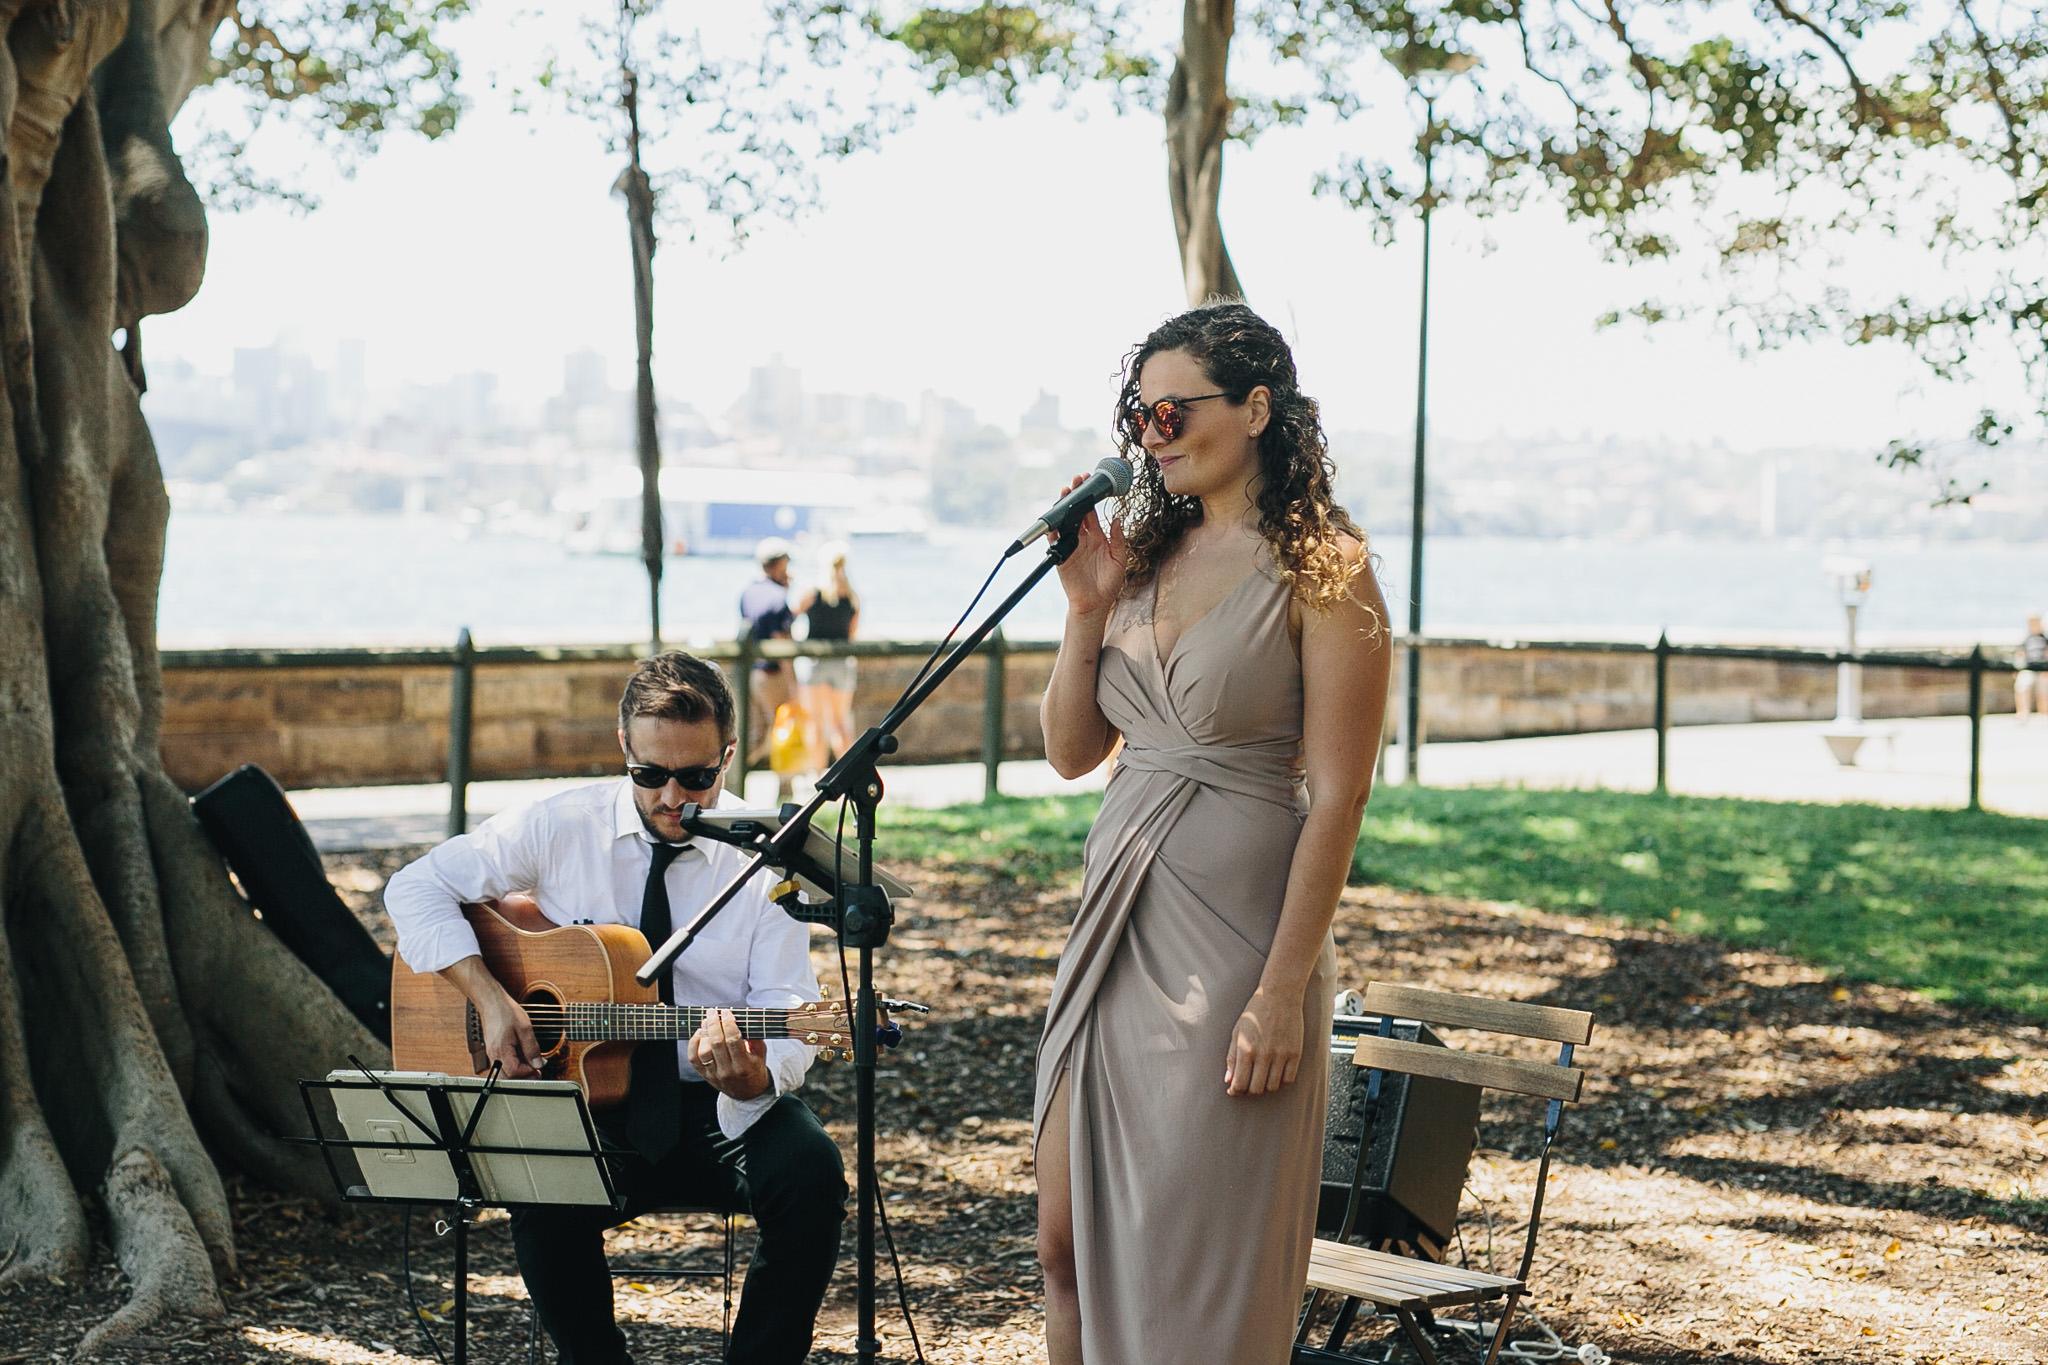 Wedding singer at The Sydney Botanic Gardens Harbour View Lawn. Wedding planning by Samantha Burke Events.